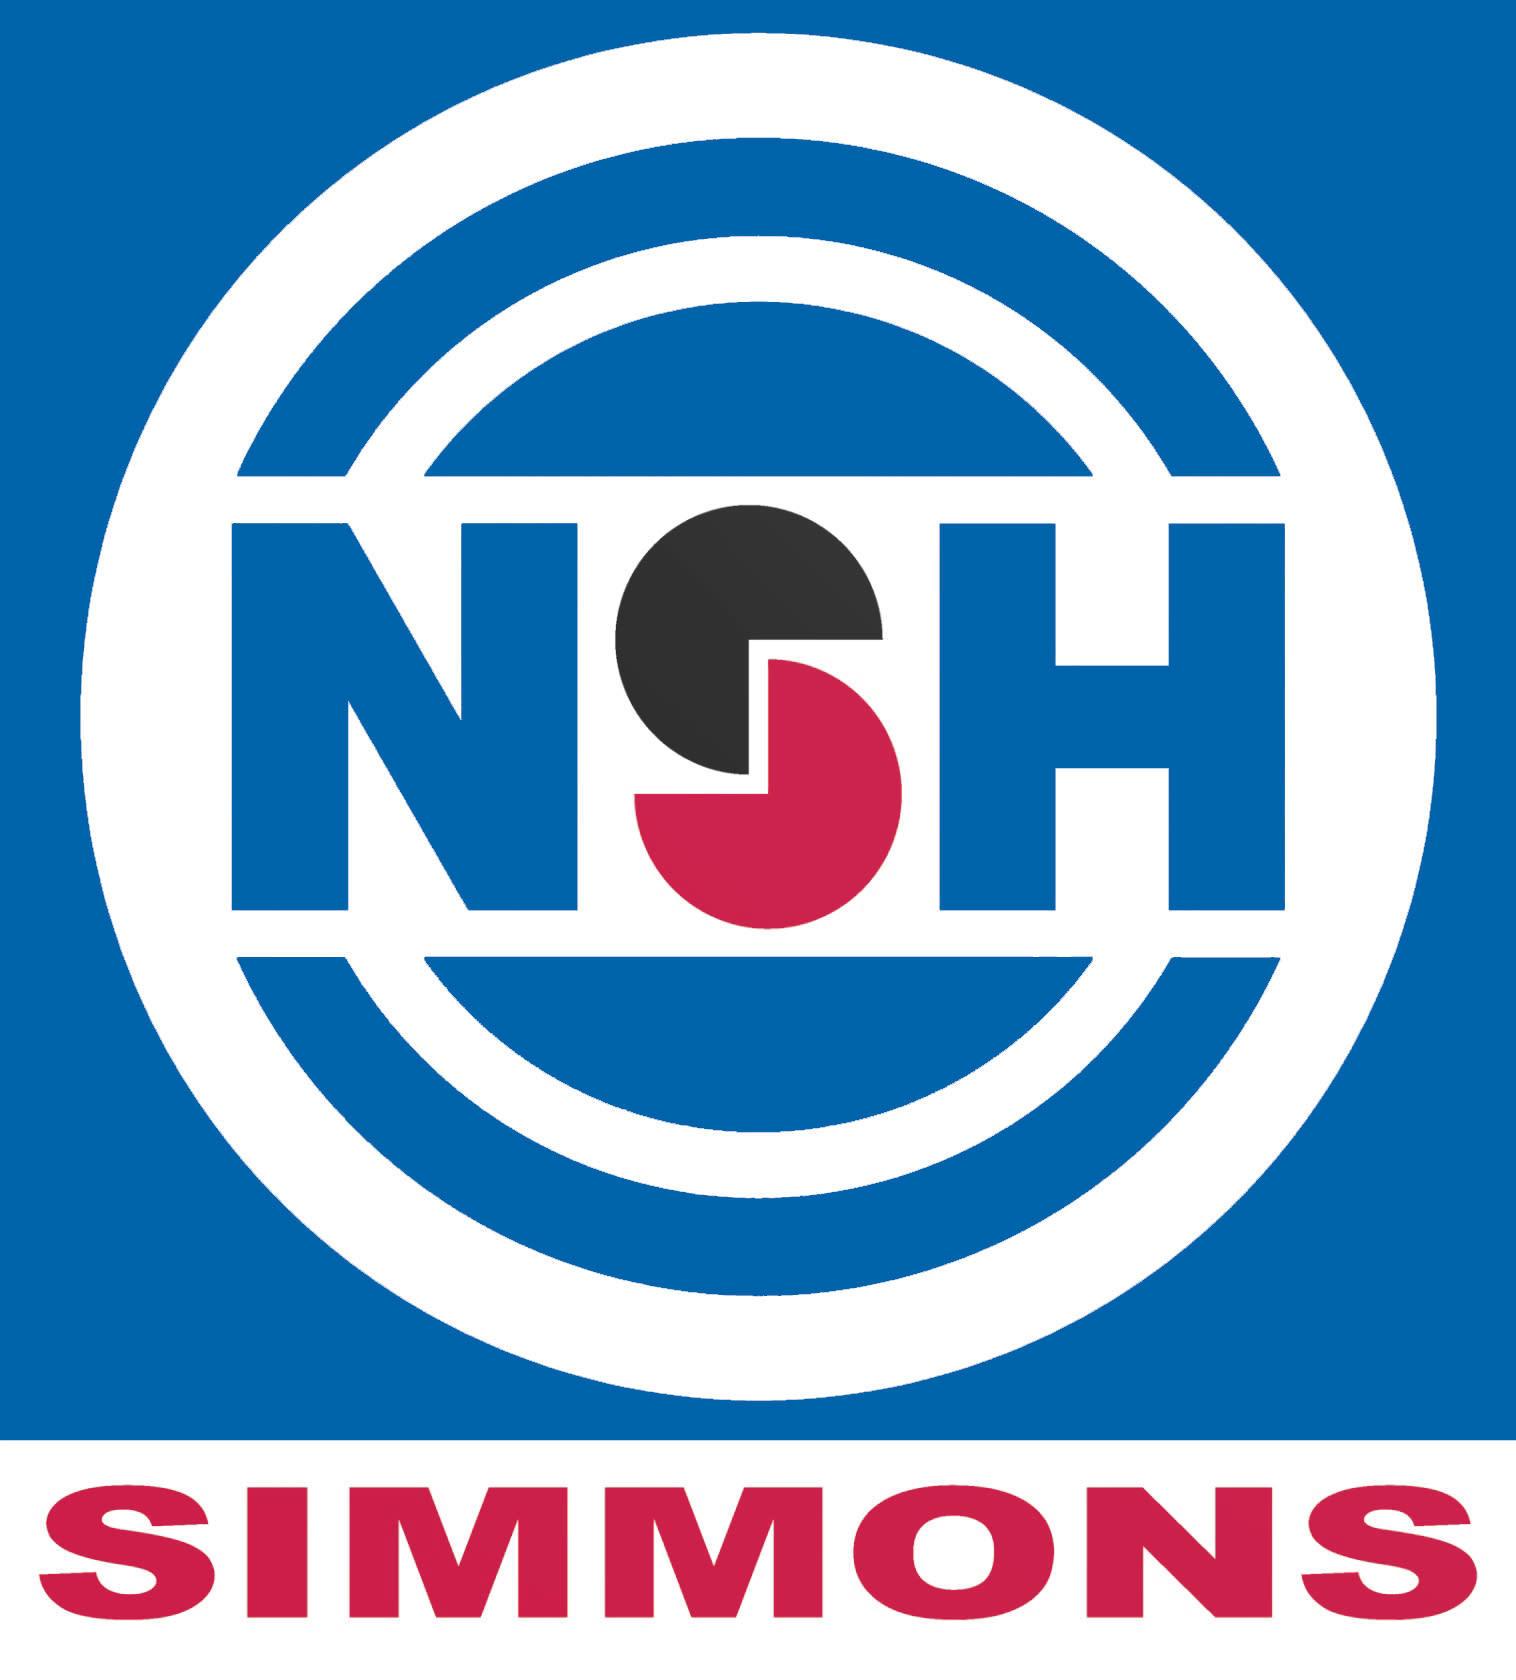 Simmons Machine Tool Corporation's logo - Albany, New York, USA